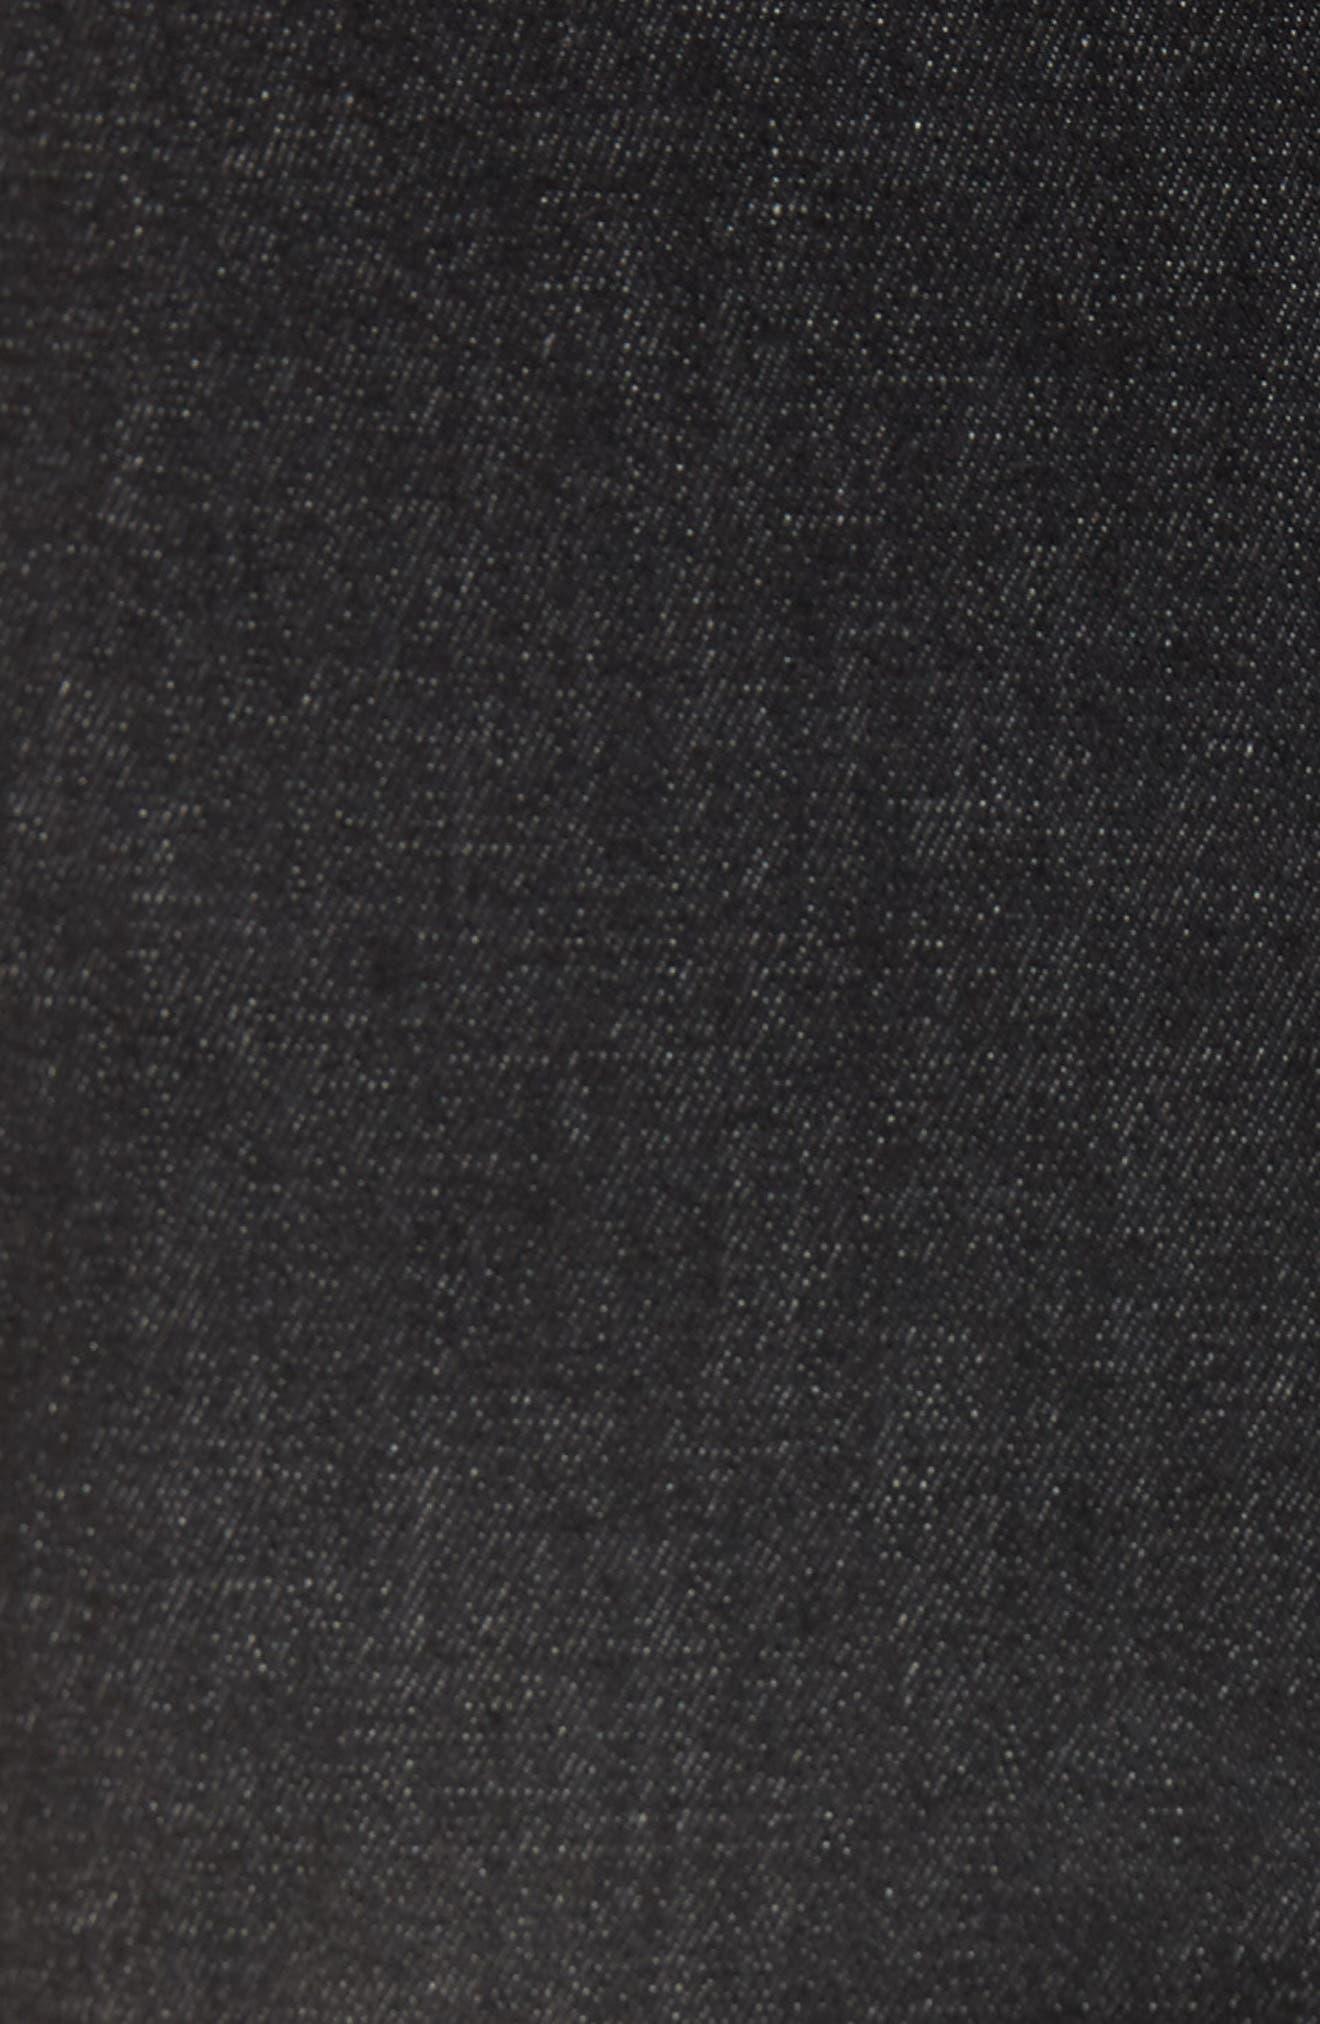 High Waist Embellished Denim Skimmer Leggings,                             Alternate thumbnail 5, color,                             BLACK WASH